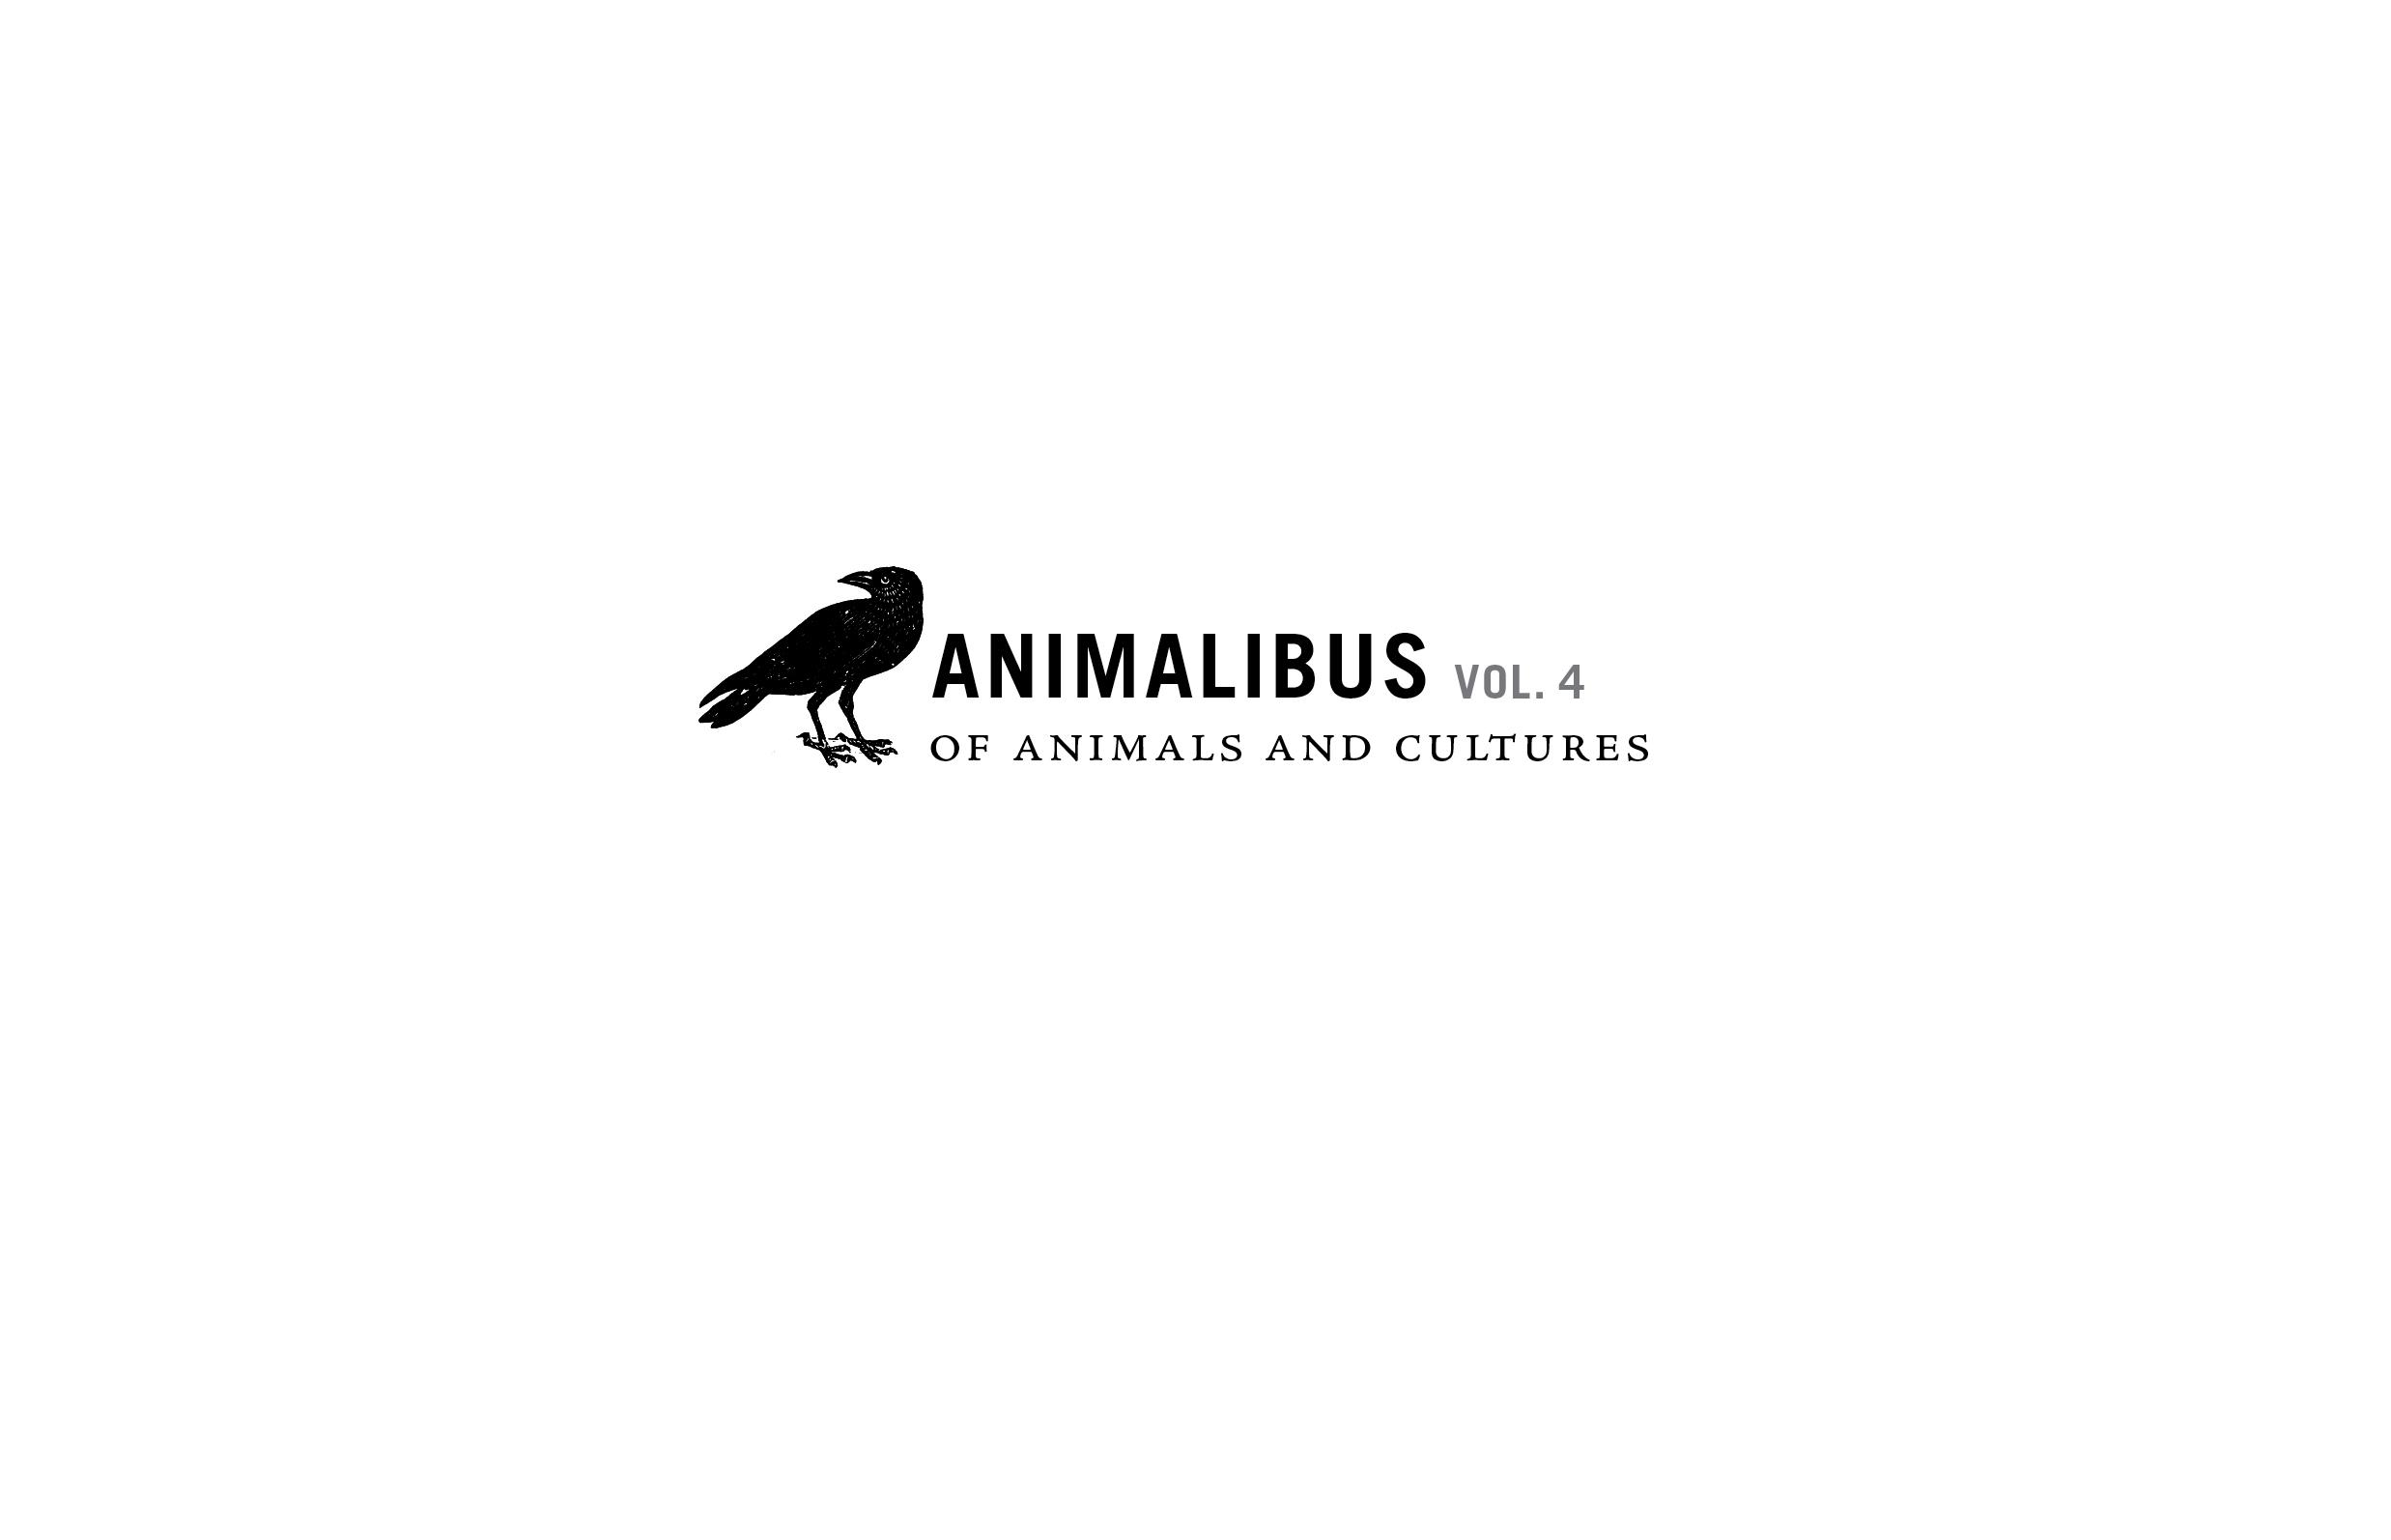 animalibus_mark.jpg